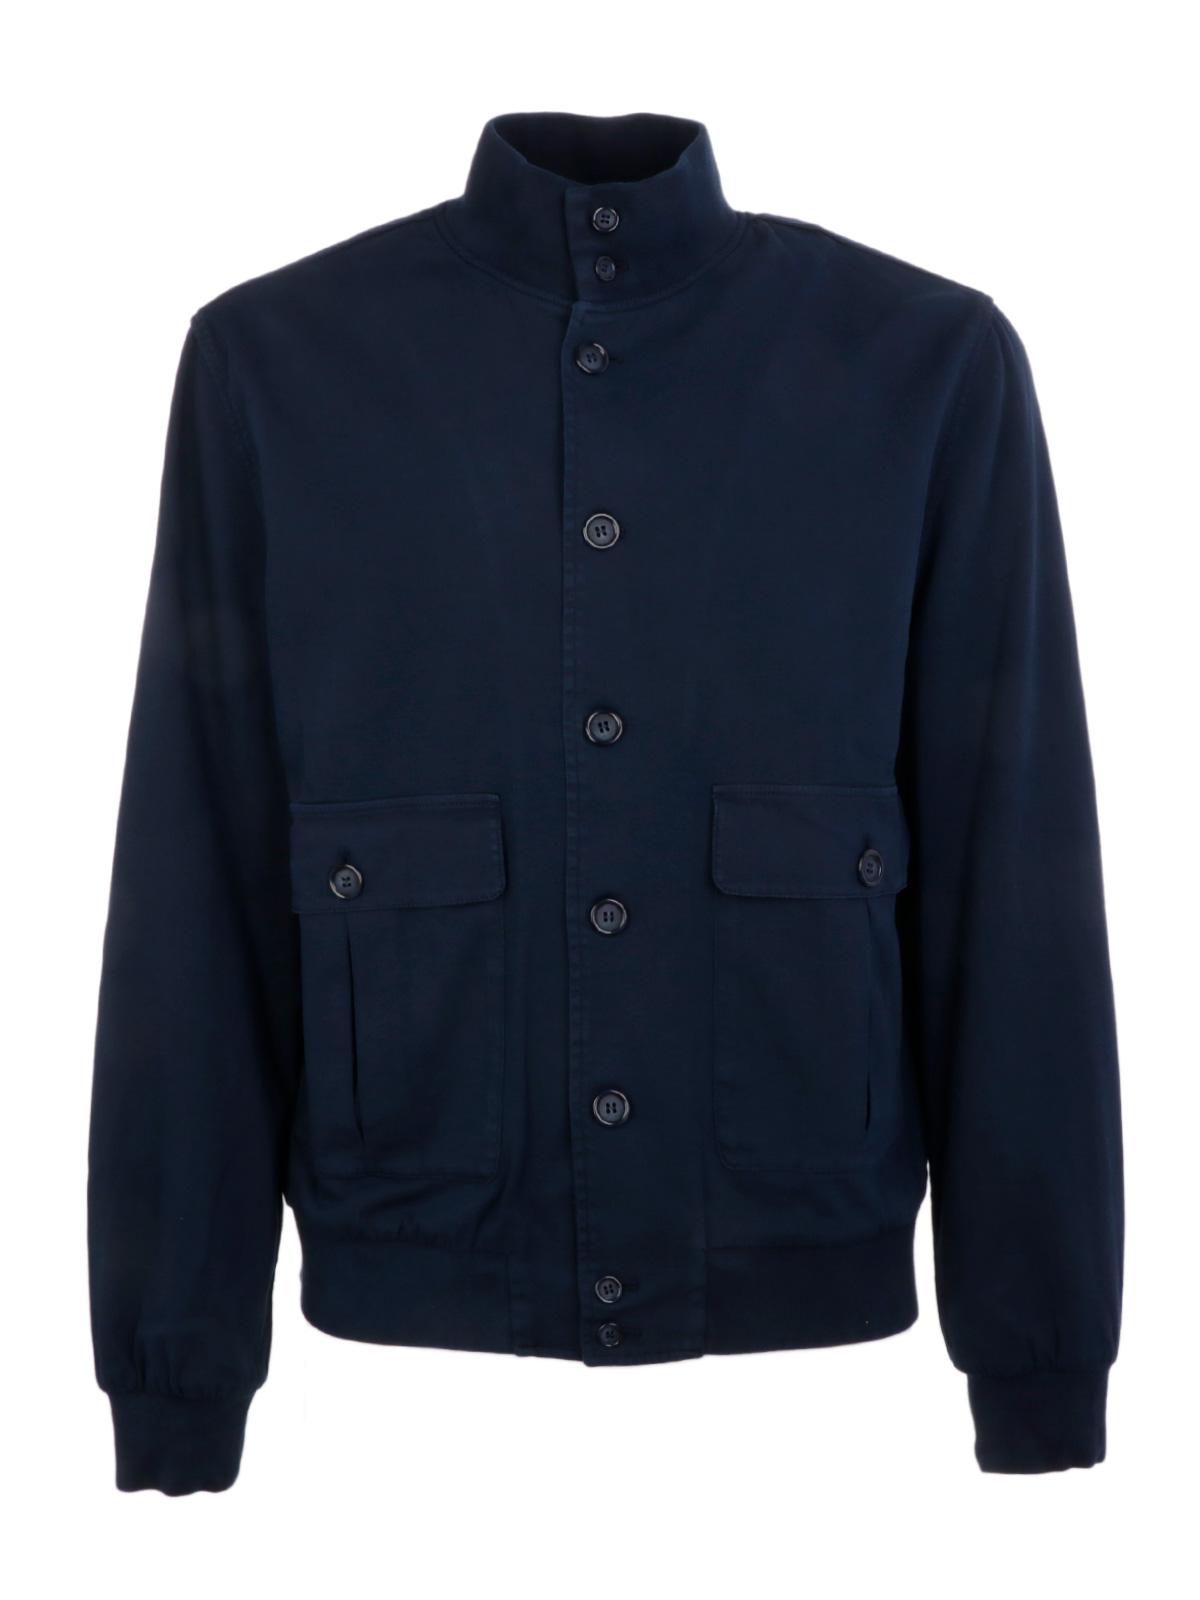 Picture of BROOKSFIELD | Men's Cotton Bomber Jacket